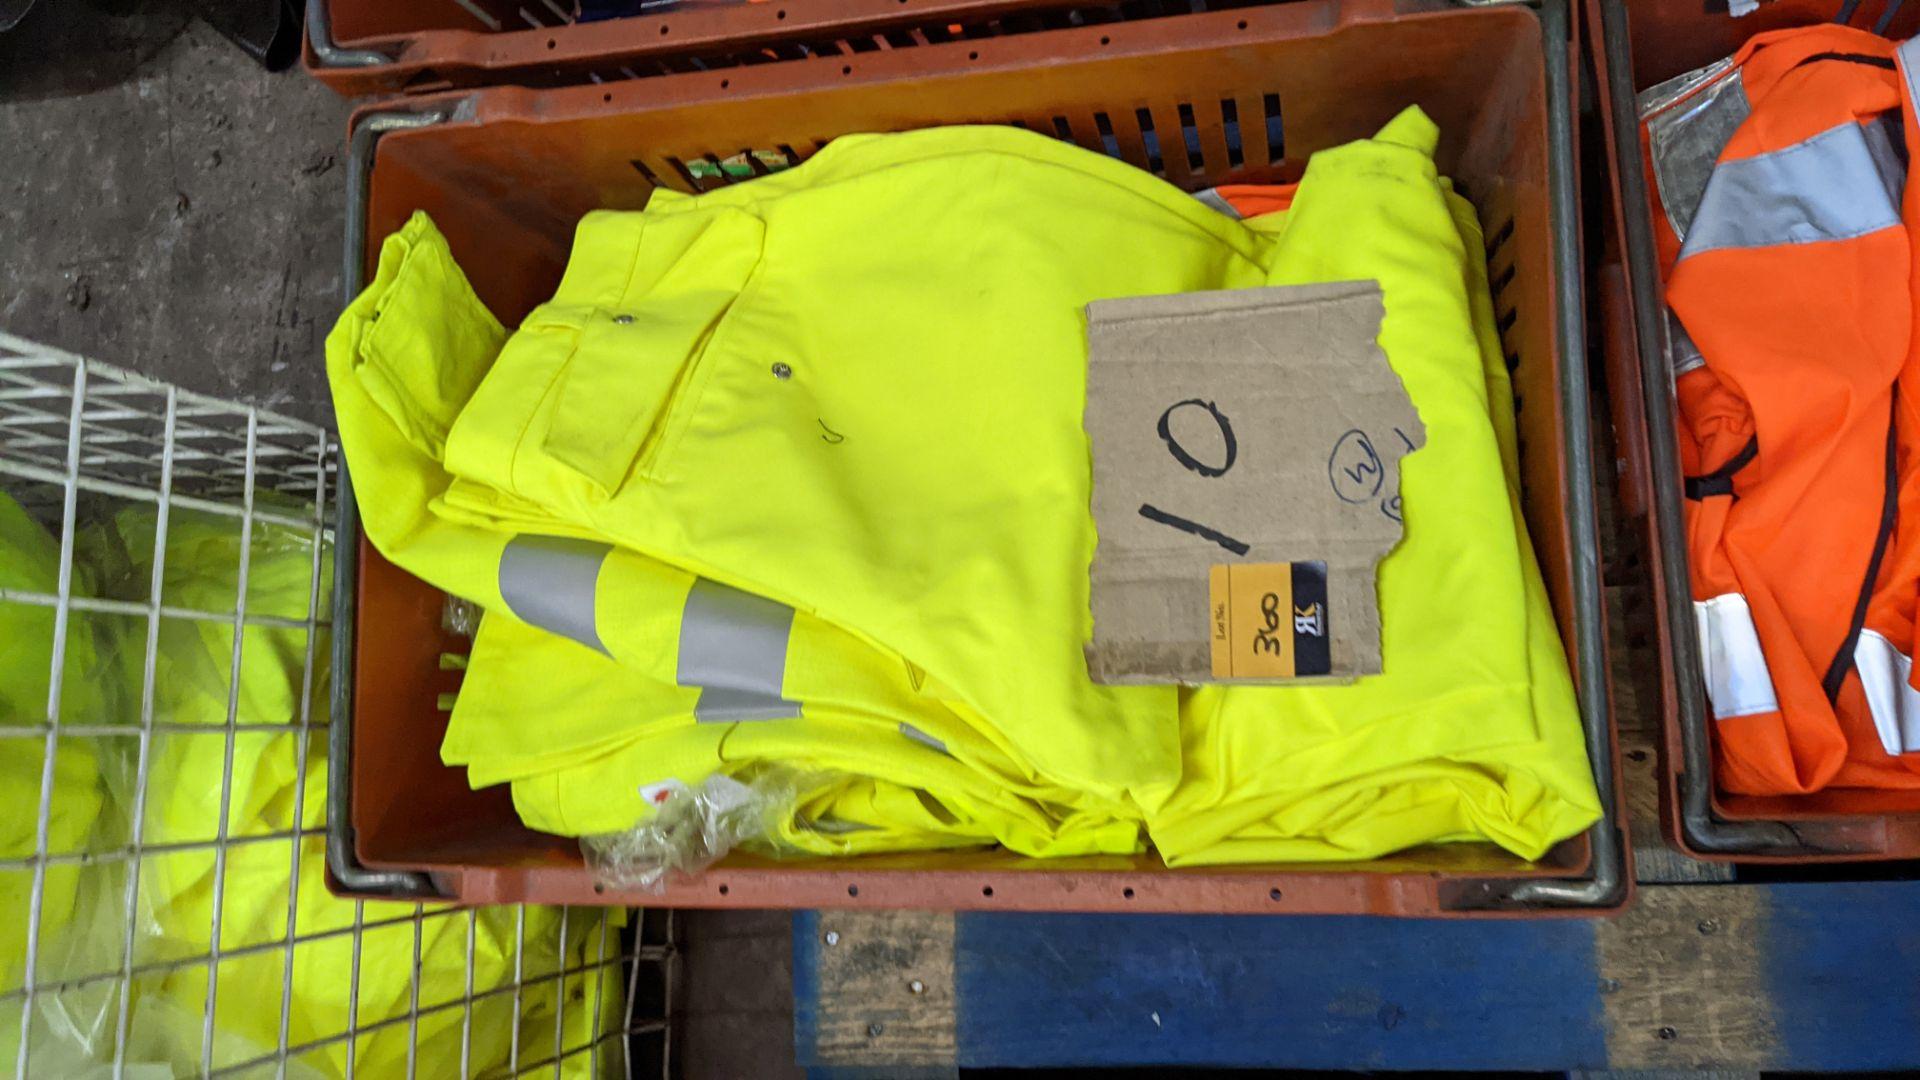 10 off hi-vis trousers in yellow & orange - Image 3 of 4